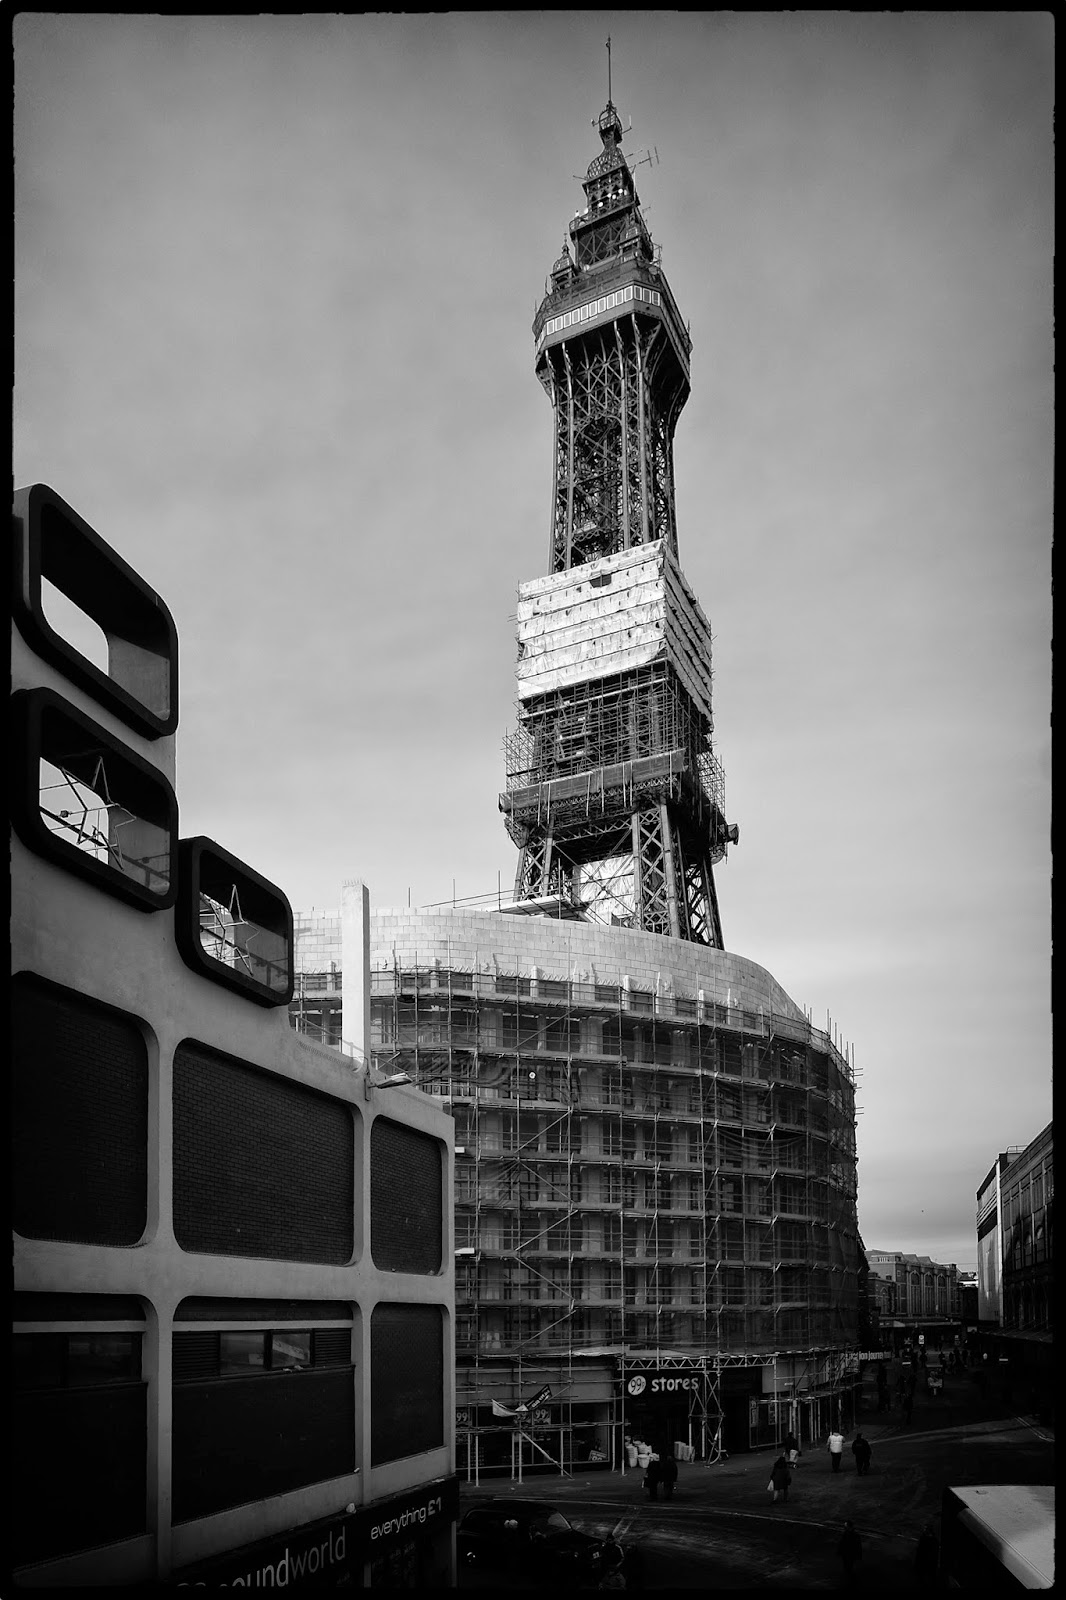 Blackpool tower lancashire black and white art photo scaffolding renovation fuji x-t1 art deco squares lights sandblasting